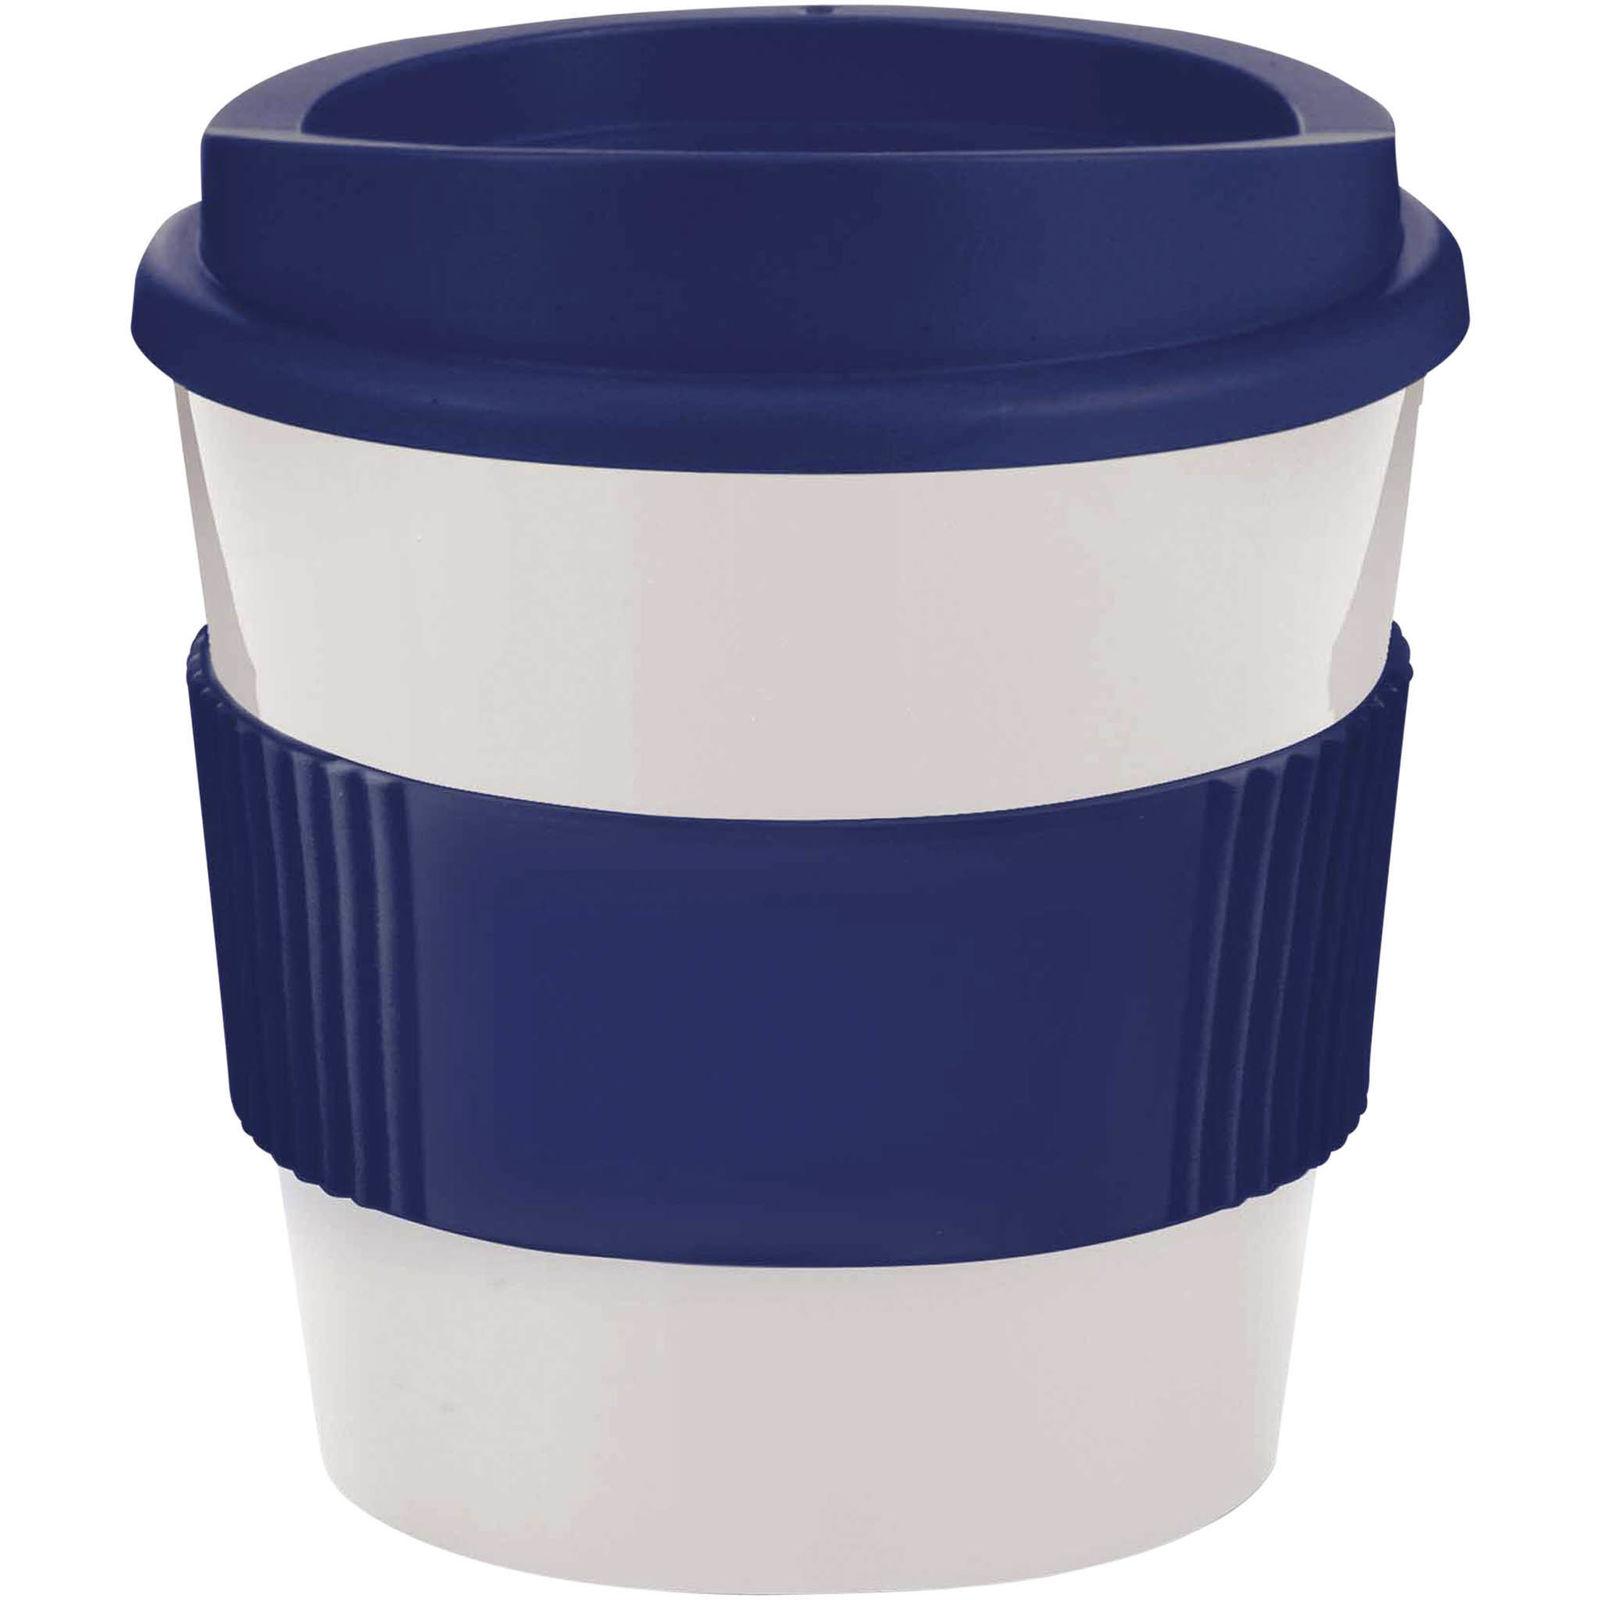 Mugs Mug Primo PublicitaireAmericano Mug Personnalisés Mugs PublicitaireAmericano Primo ymPvN0O8wn